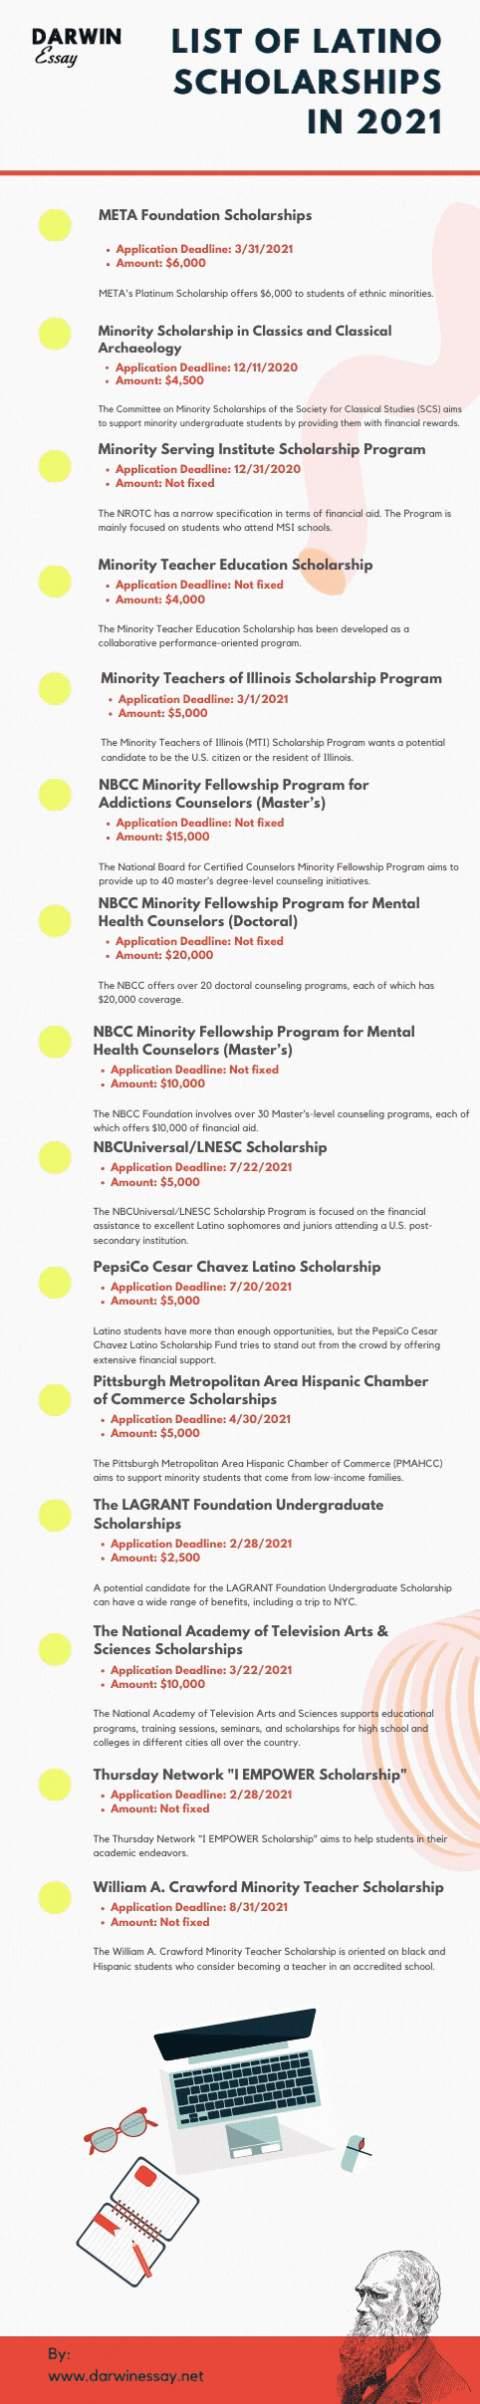 List of Latino Scholarships